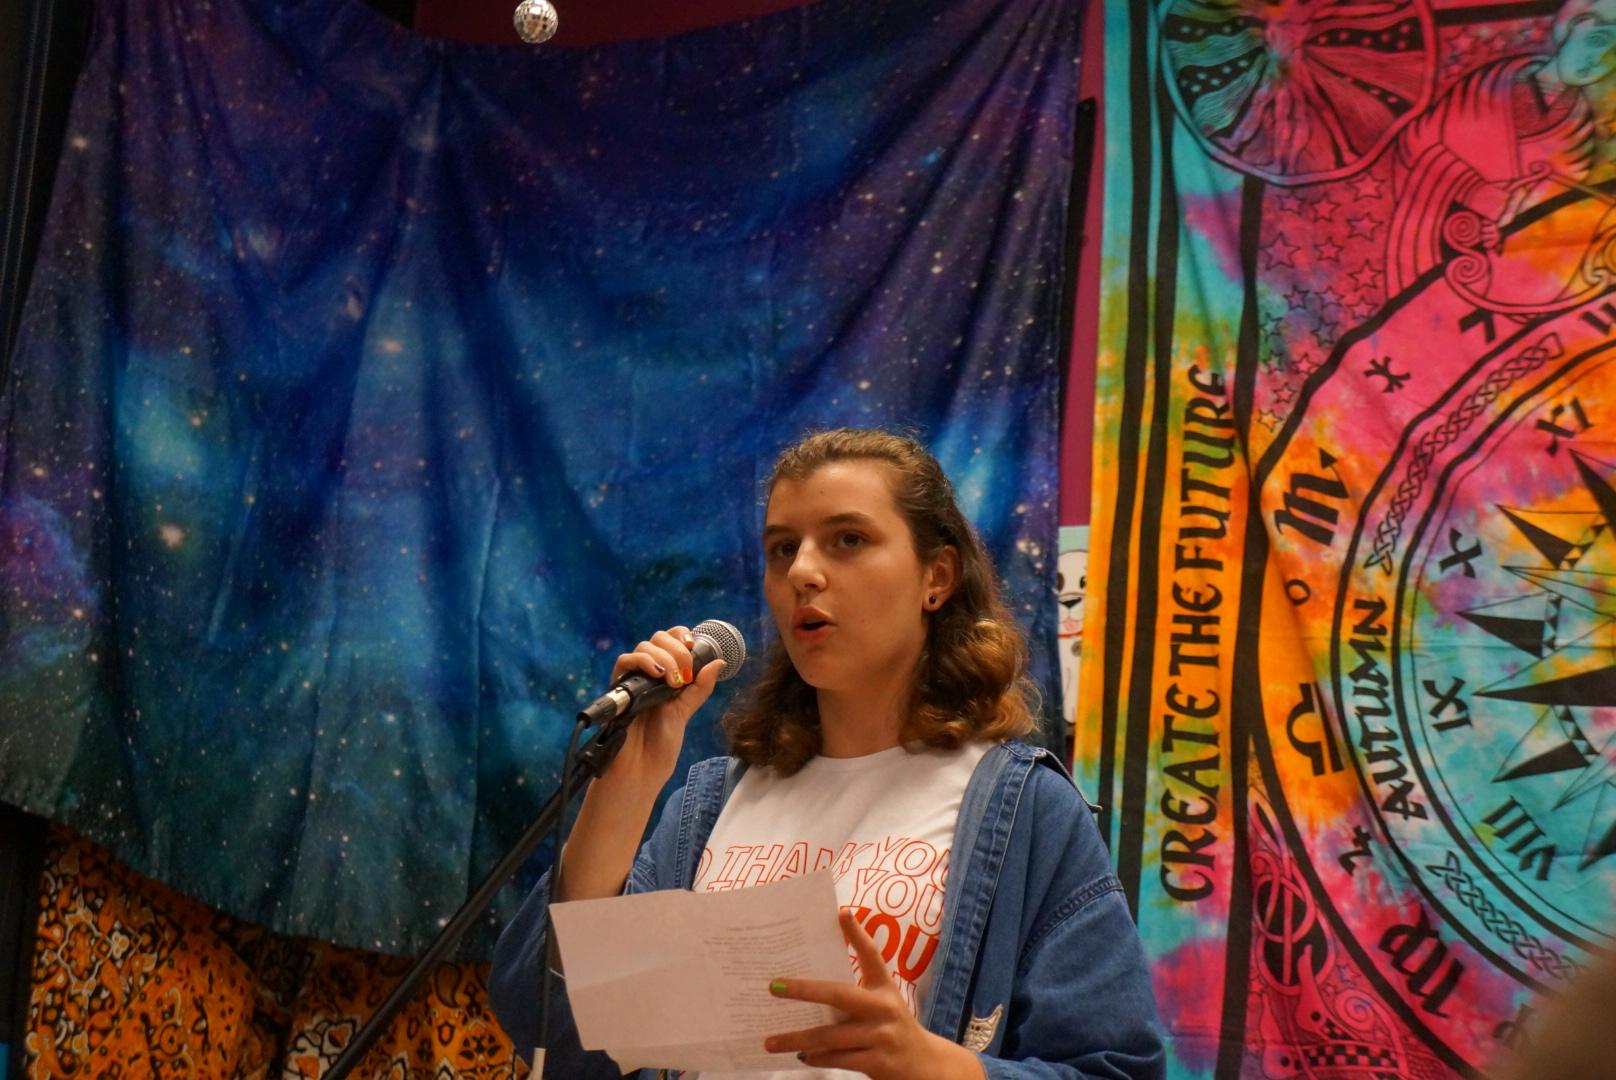 Risa Liebmann performed her spoken word